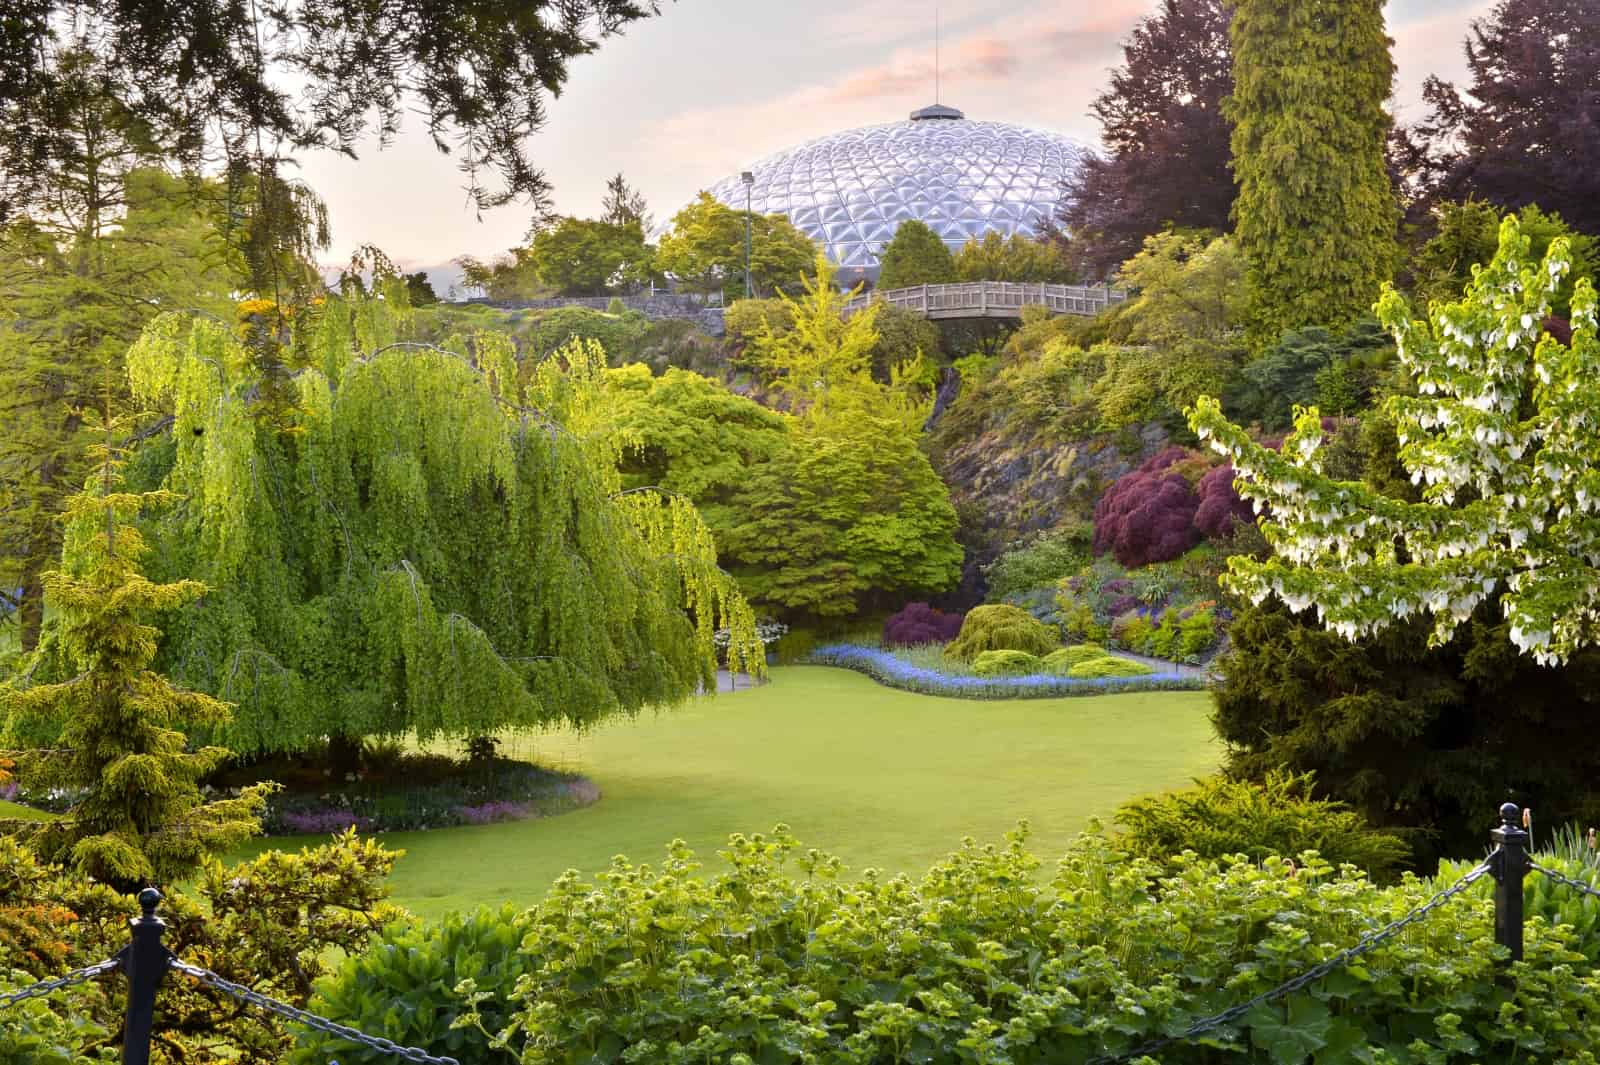 Bloedel Floral Conservatory im Queen Elizabeth Park. Foto Bloedel Conservatory